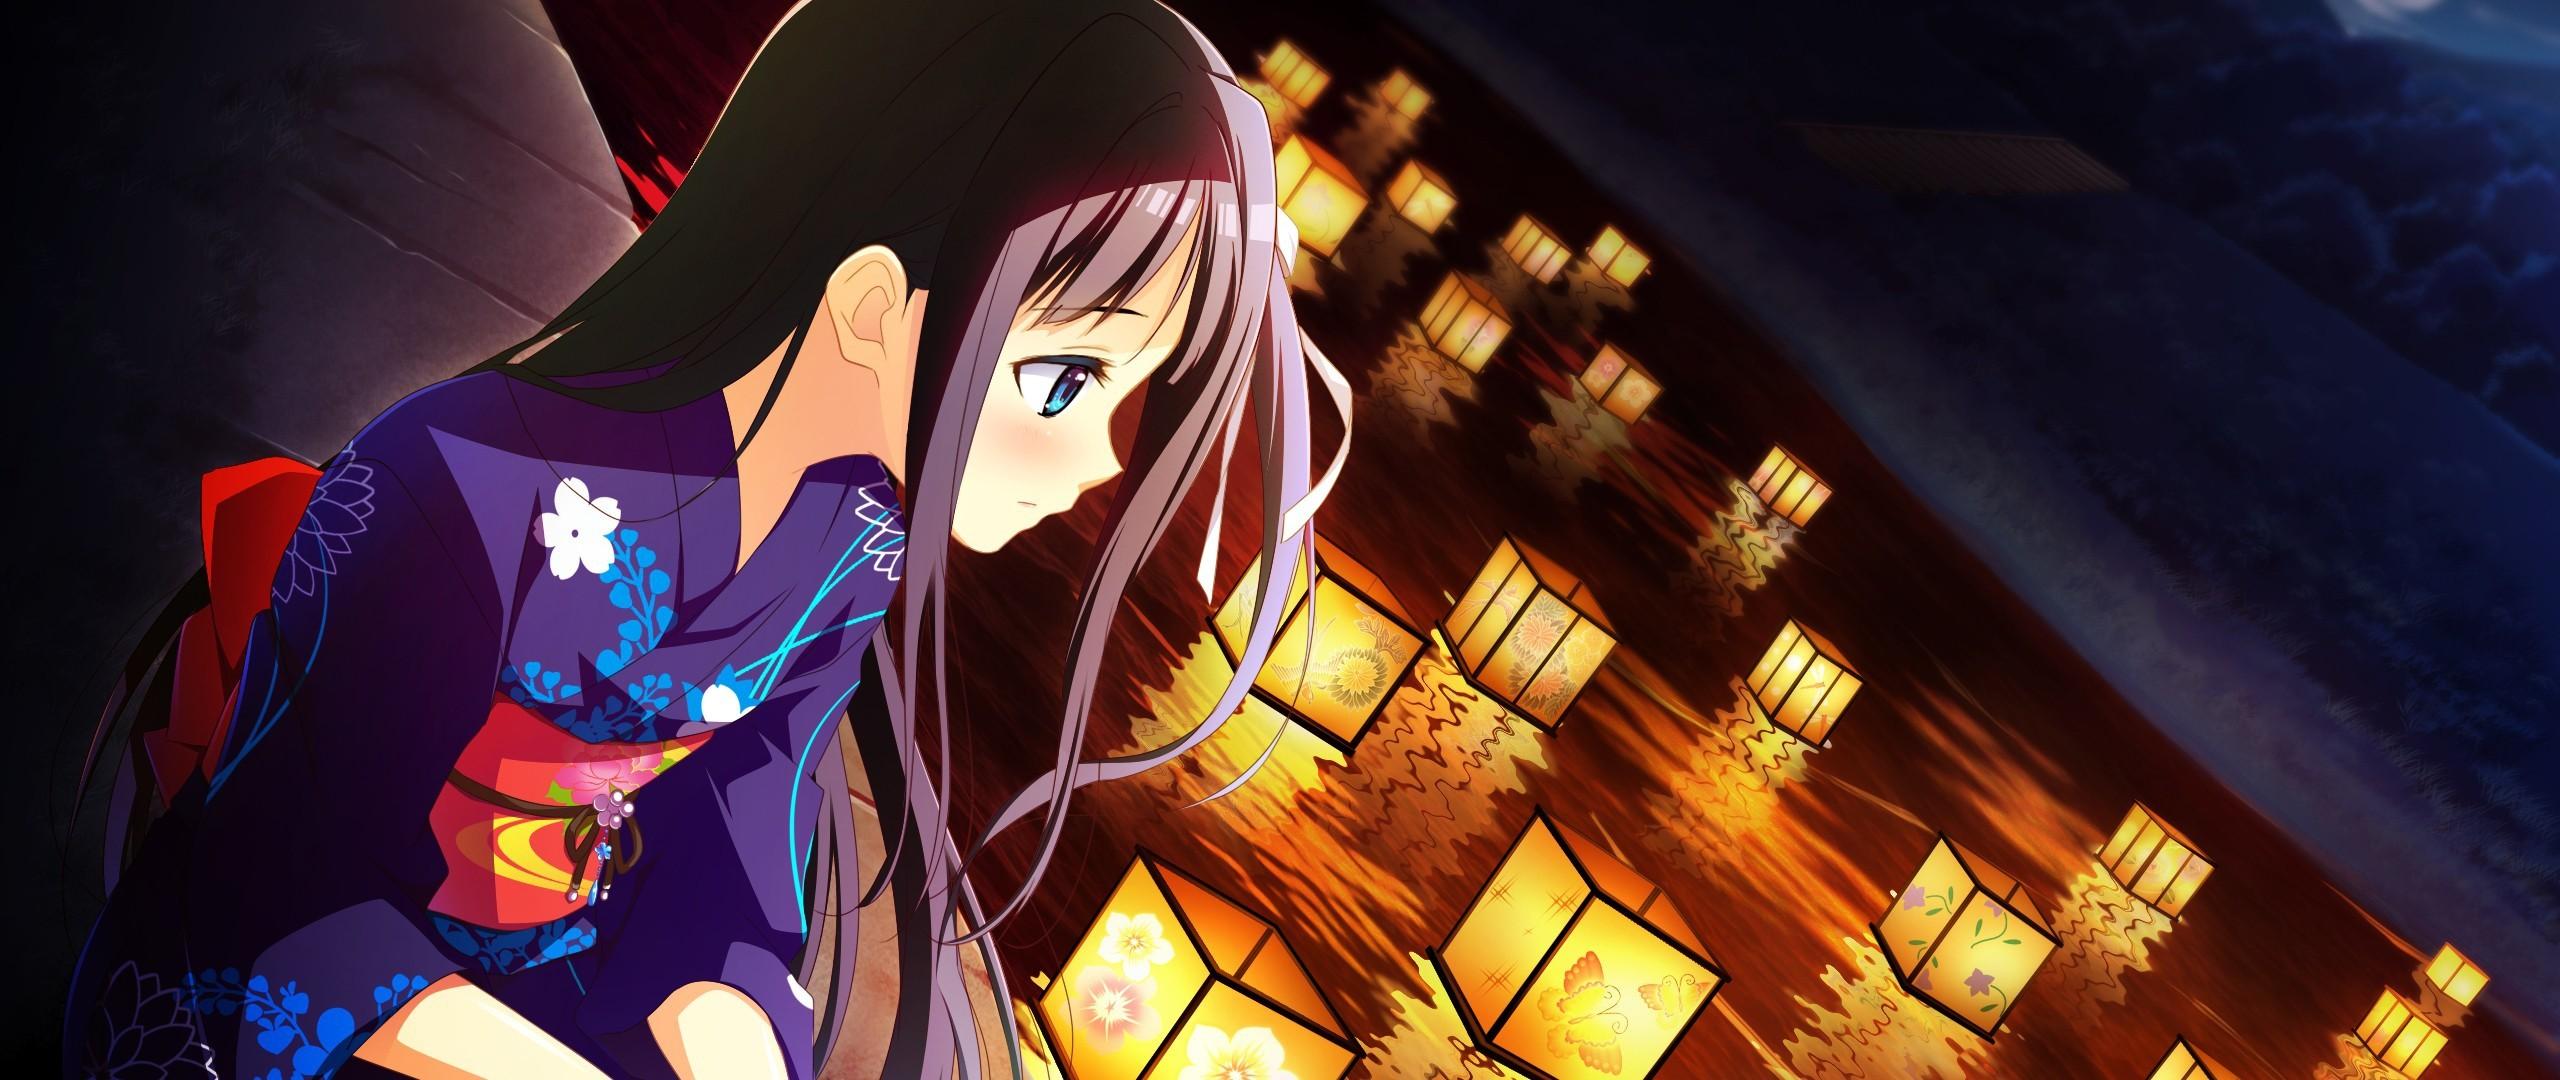 Preview wallpaper black rock shooter, girl, anime, kimono, lanterns  2560×1080